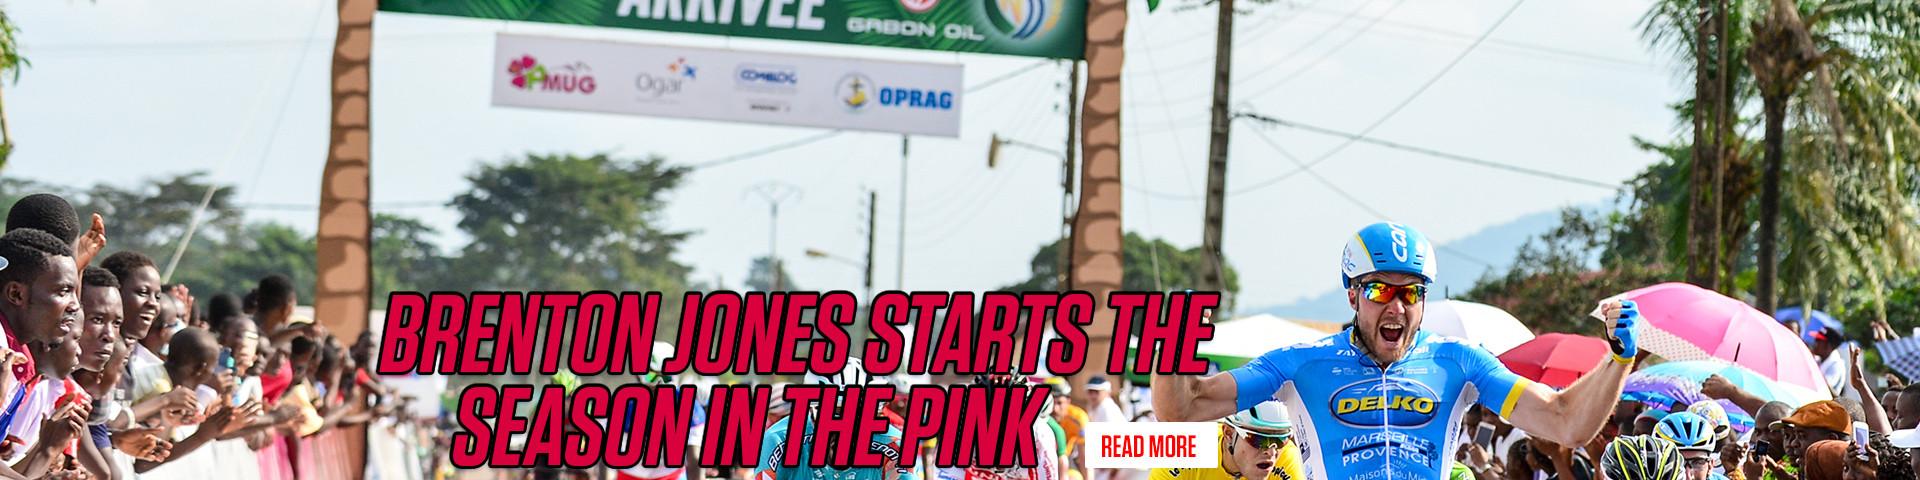 Brenton Jones starts his season in the Pink